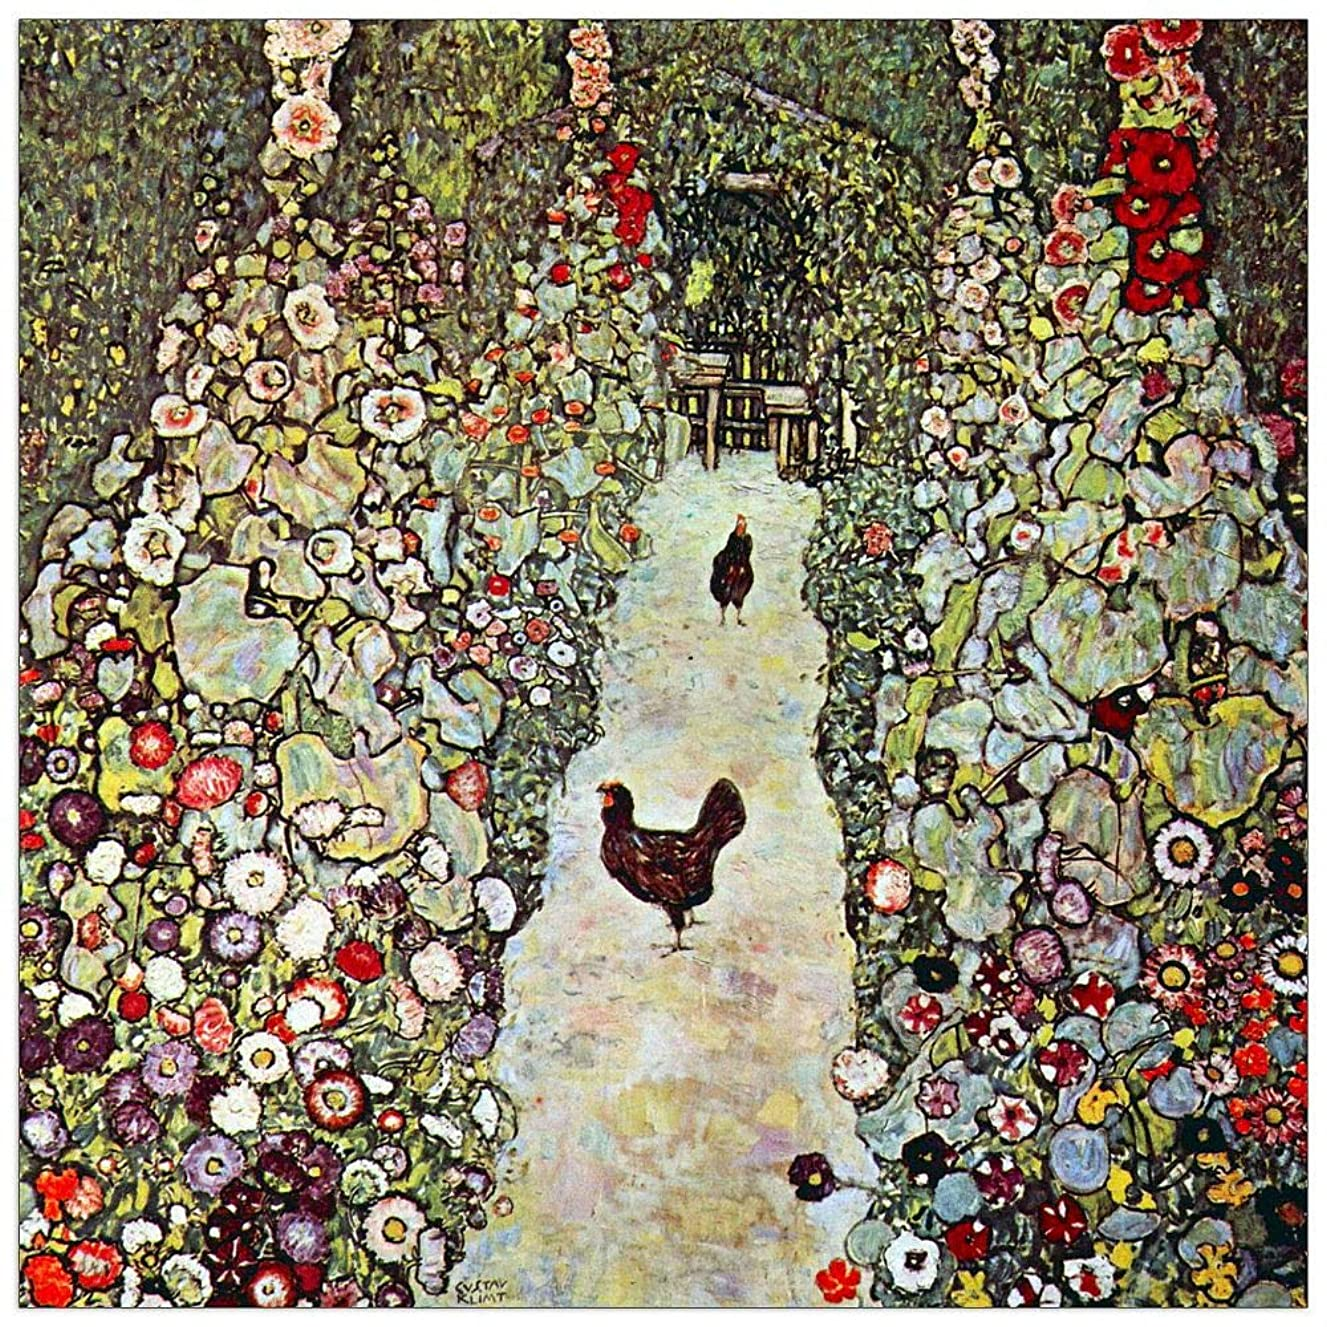 ArtPlaza TW90322 Klimt Gustav - Garden Path with Chickens Decorative Panel 15.5x15.5 Inch Multicolored